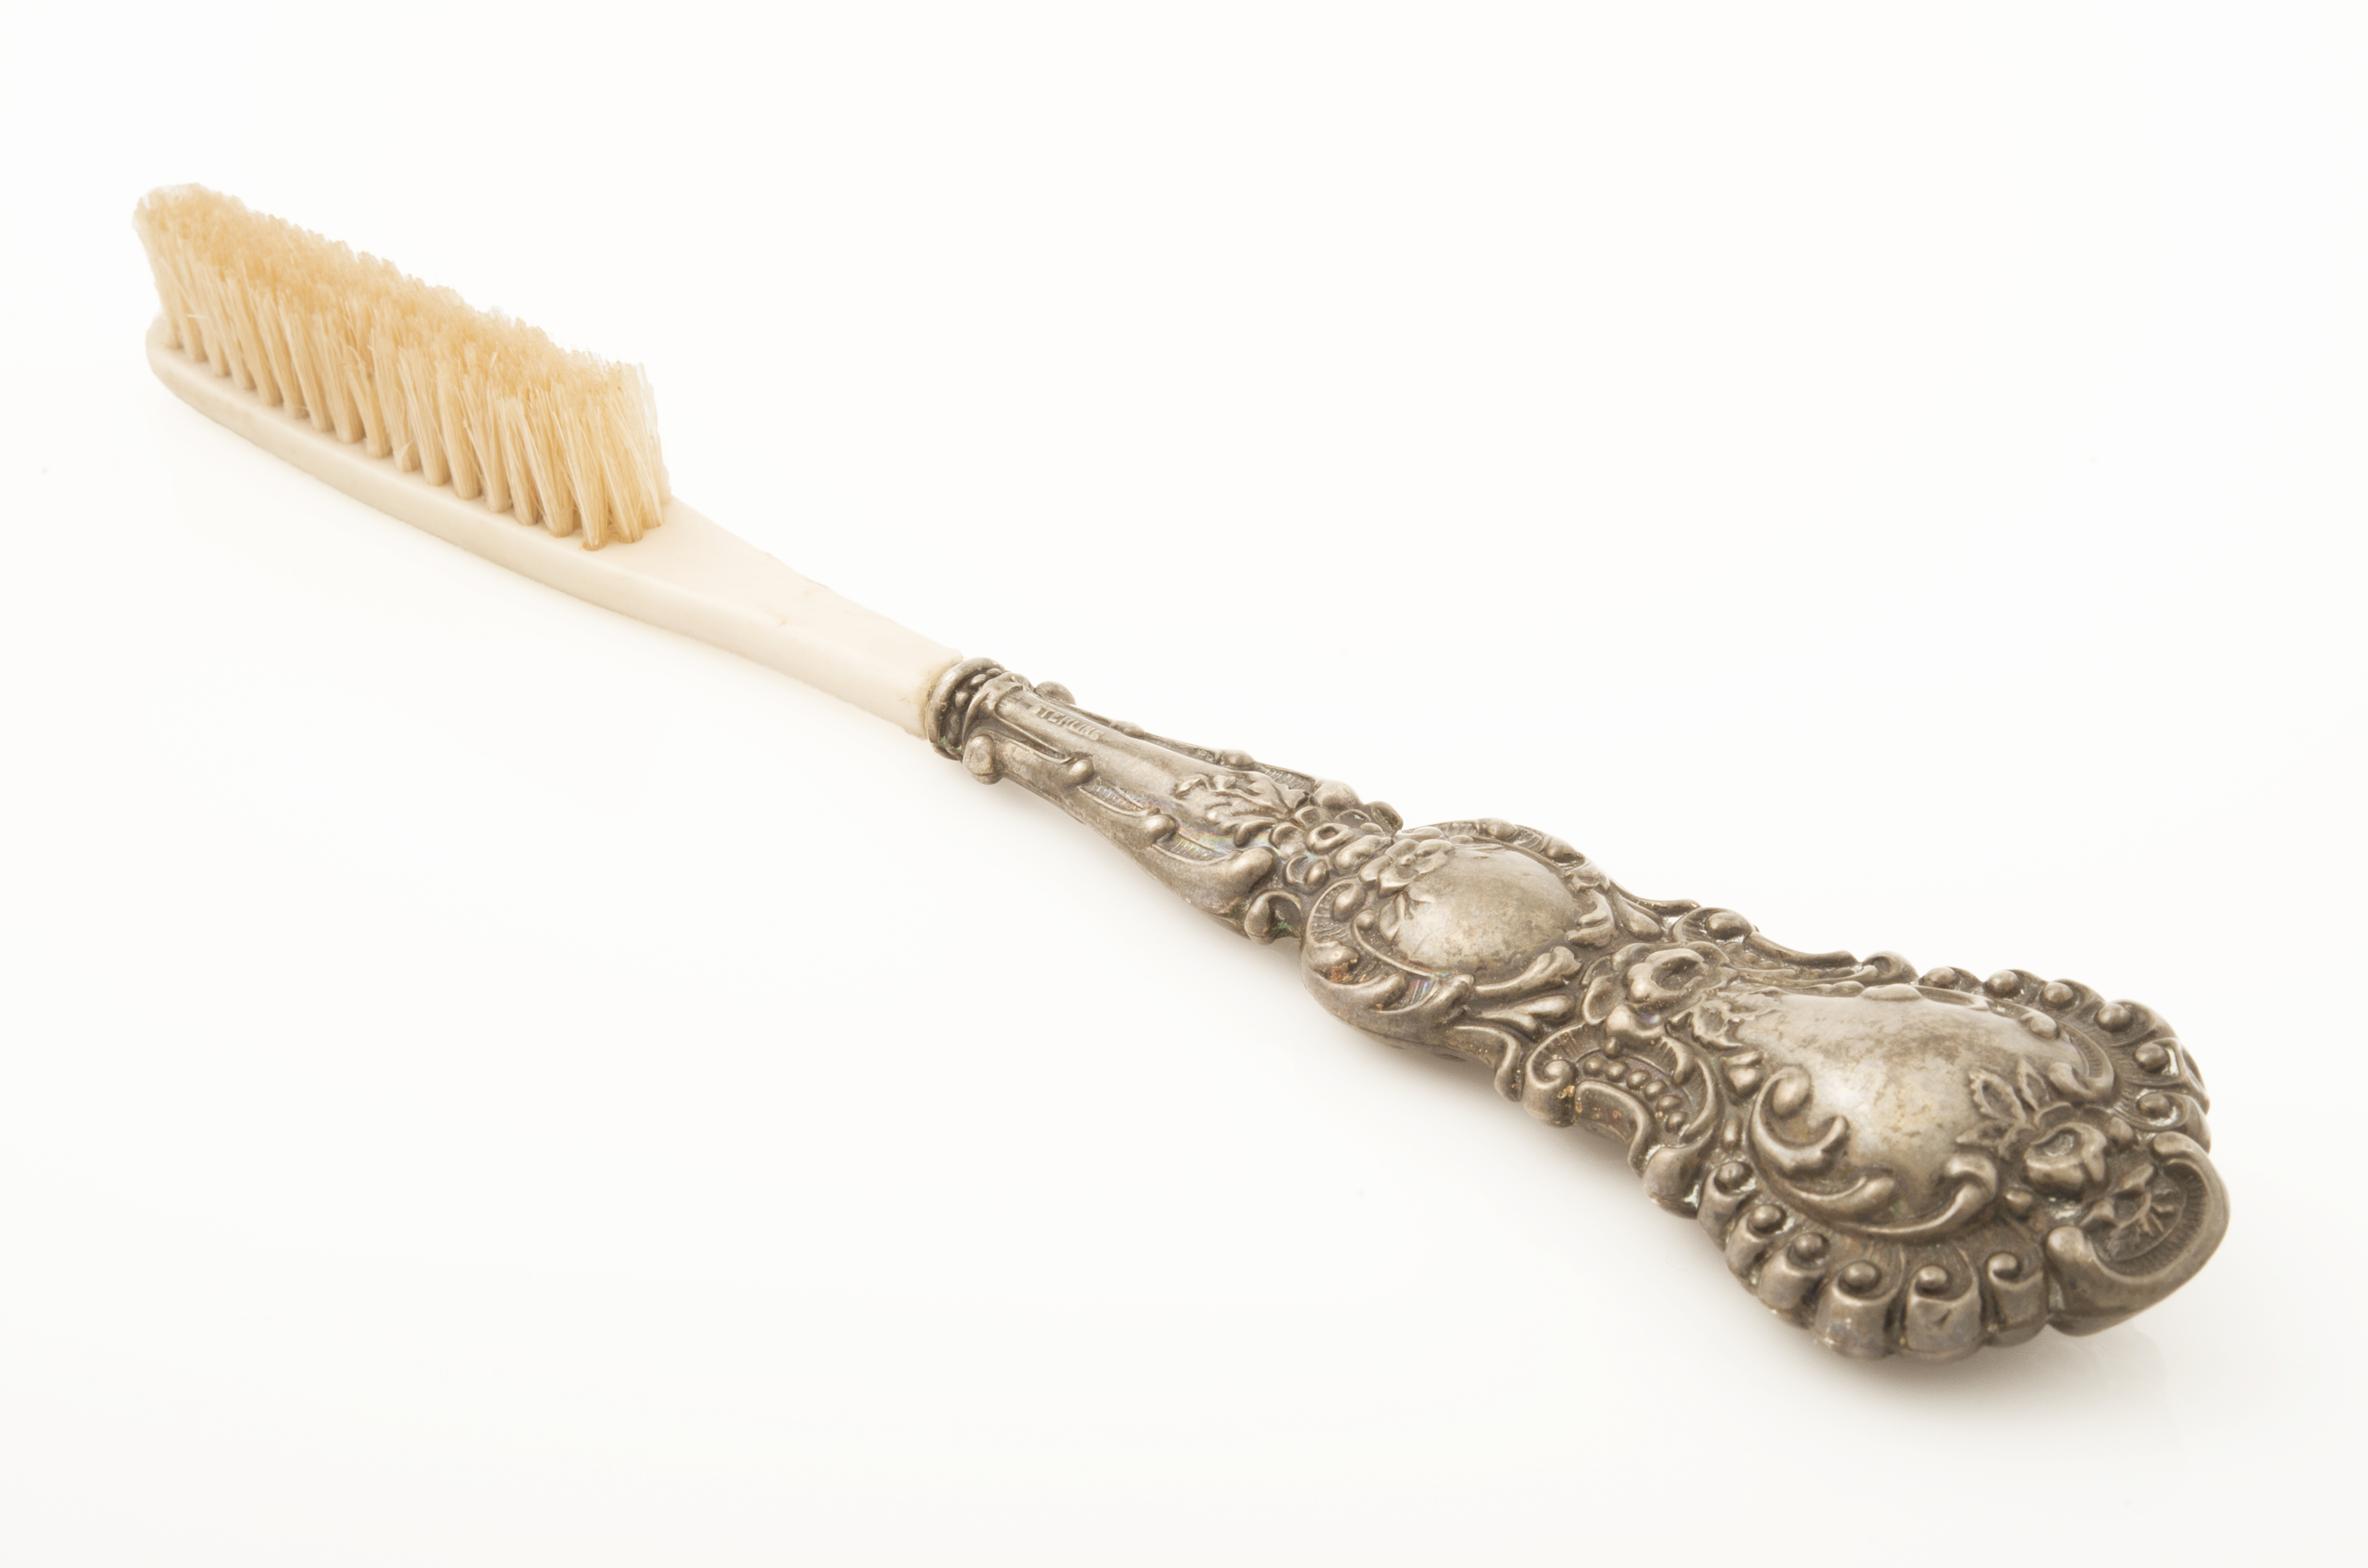 Victorian-era French toothbrush